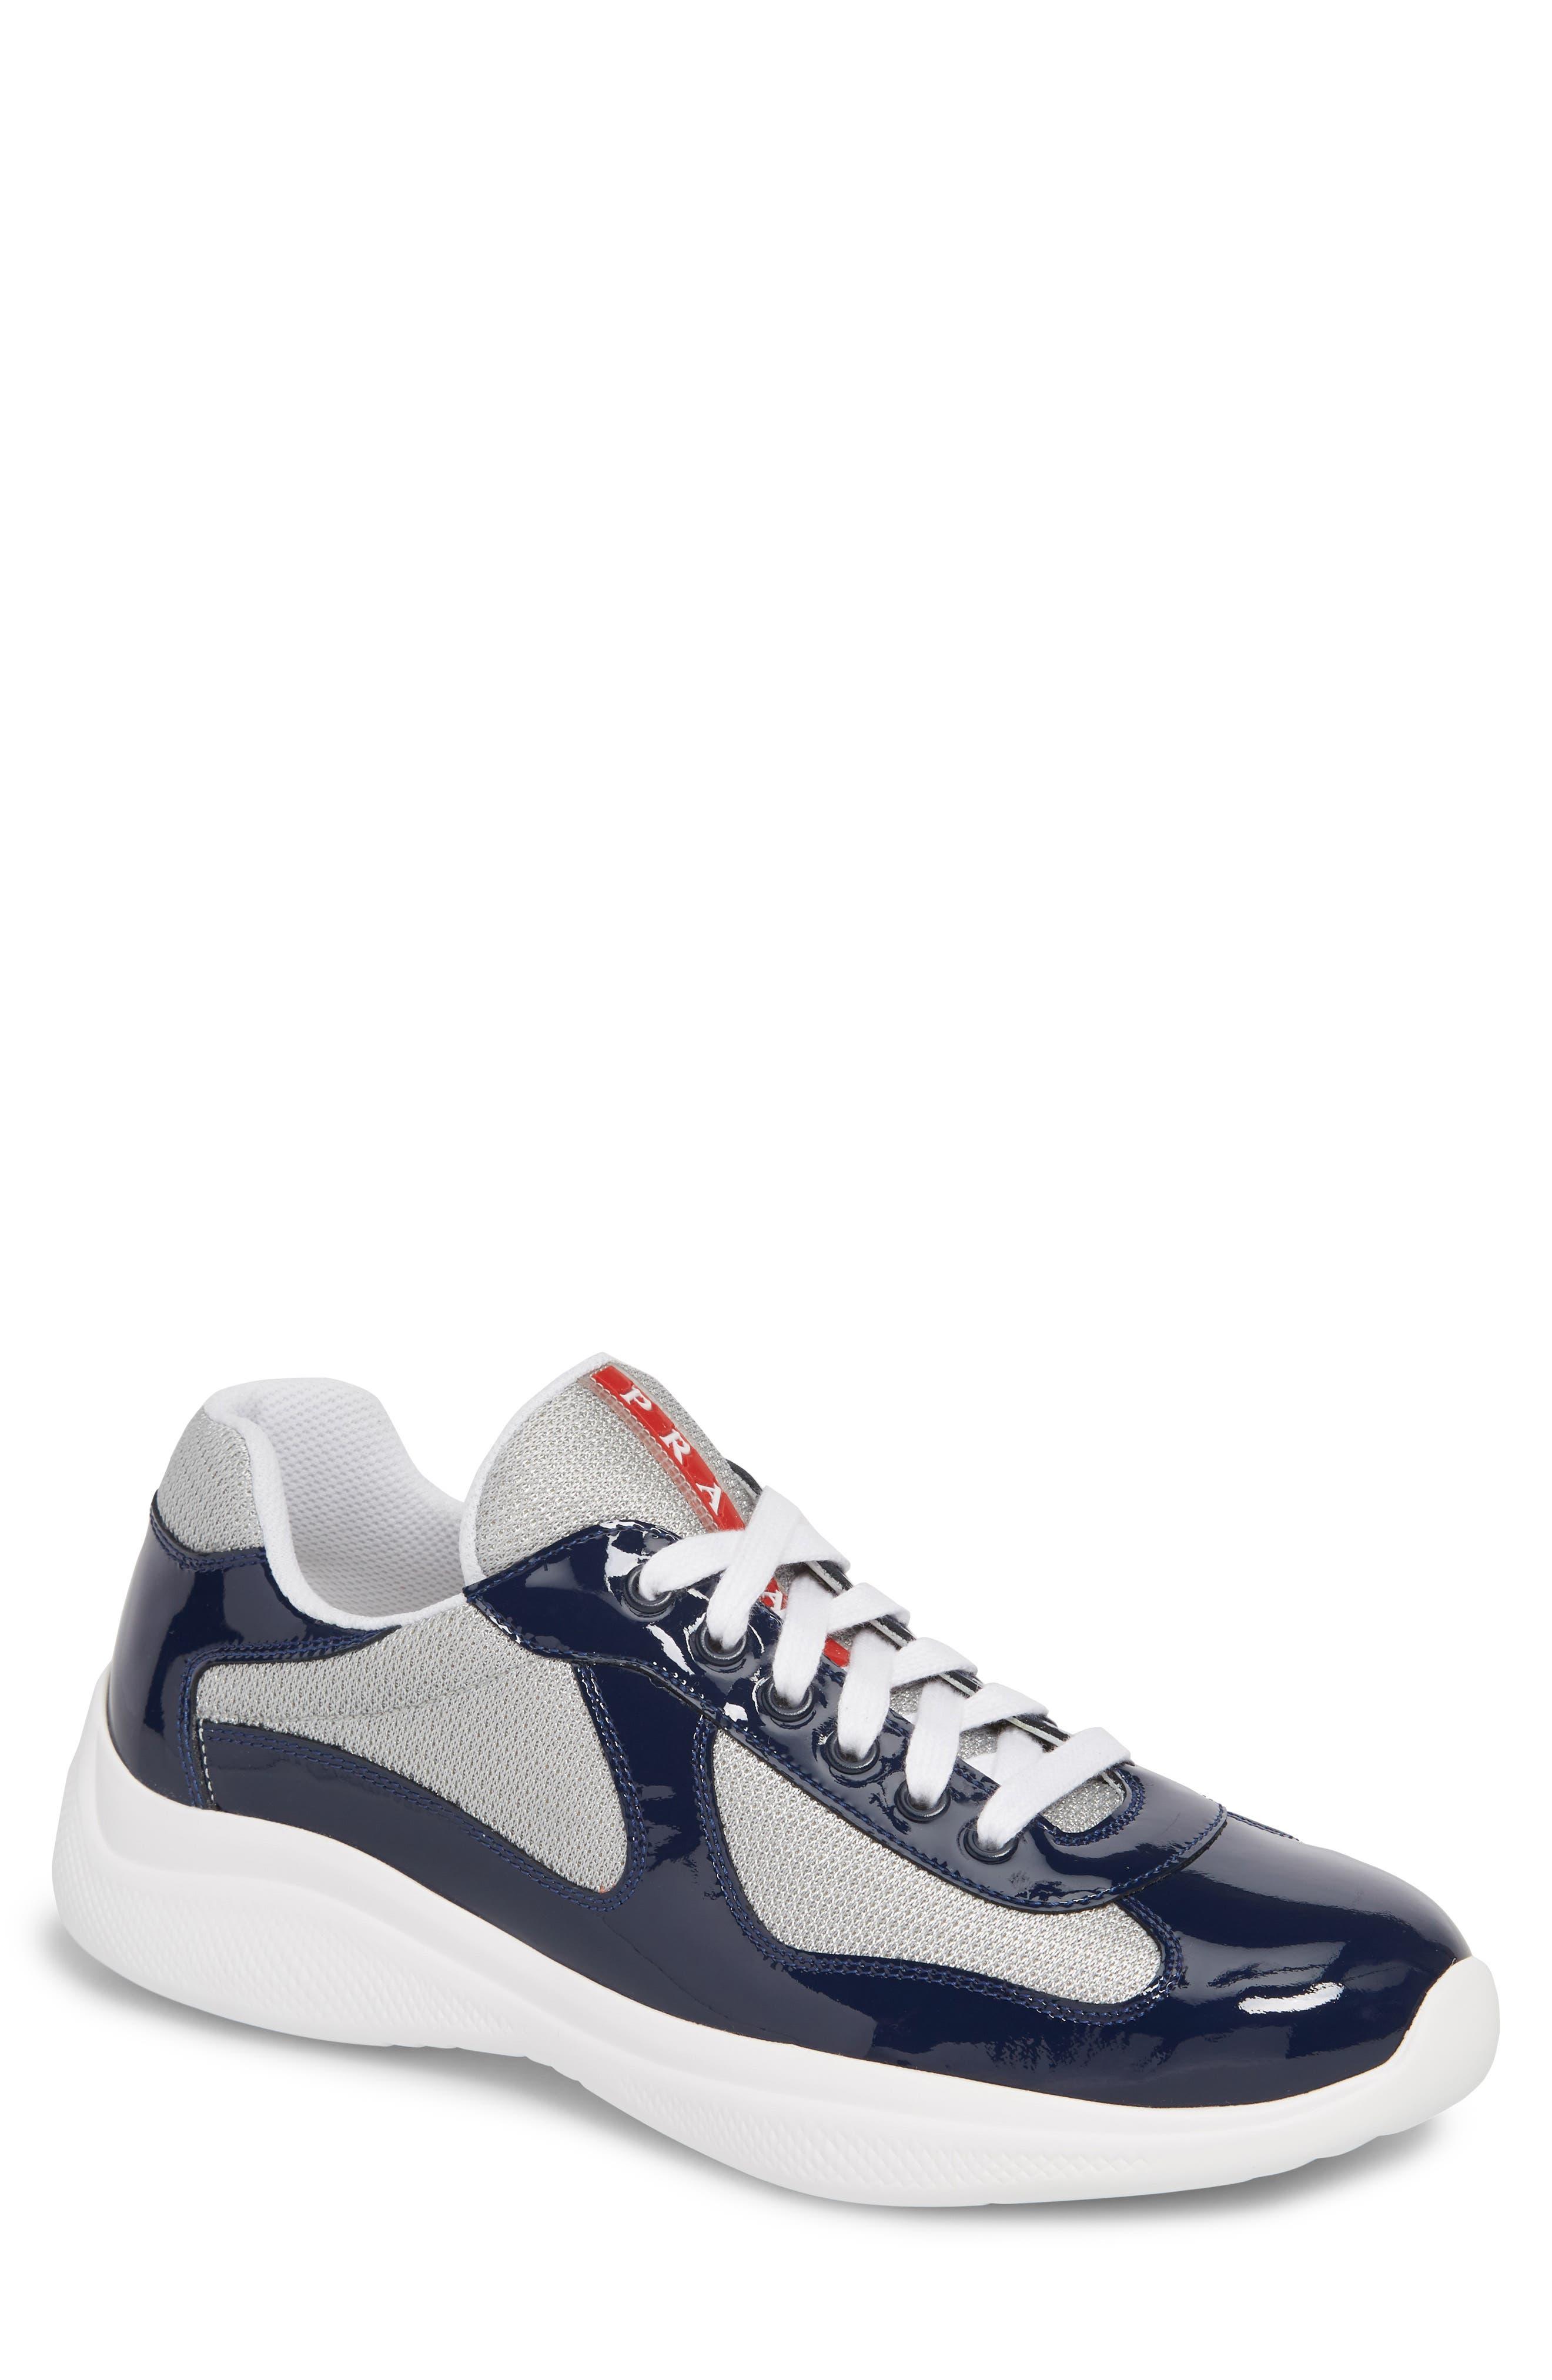 Men's Prada Shoes | Nordstrom